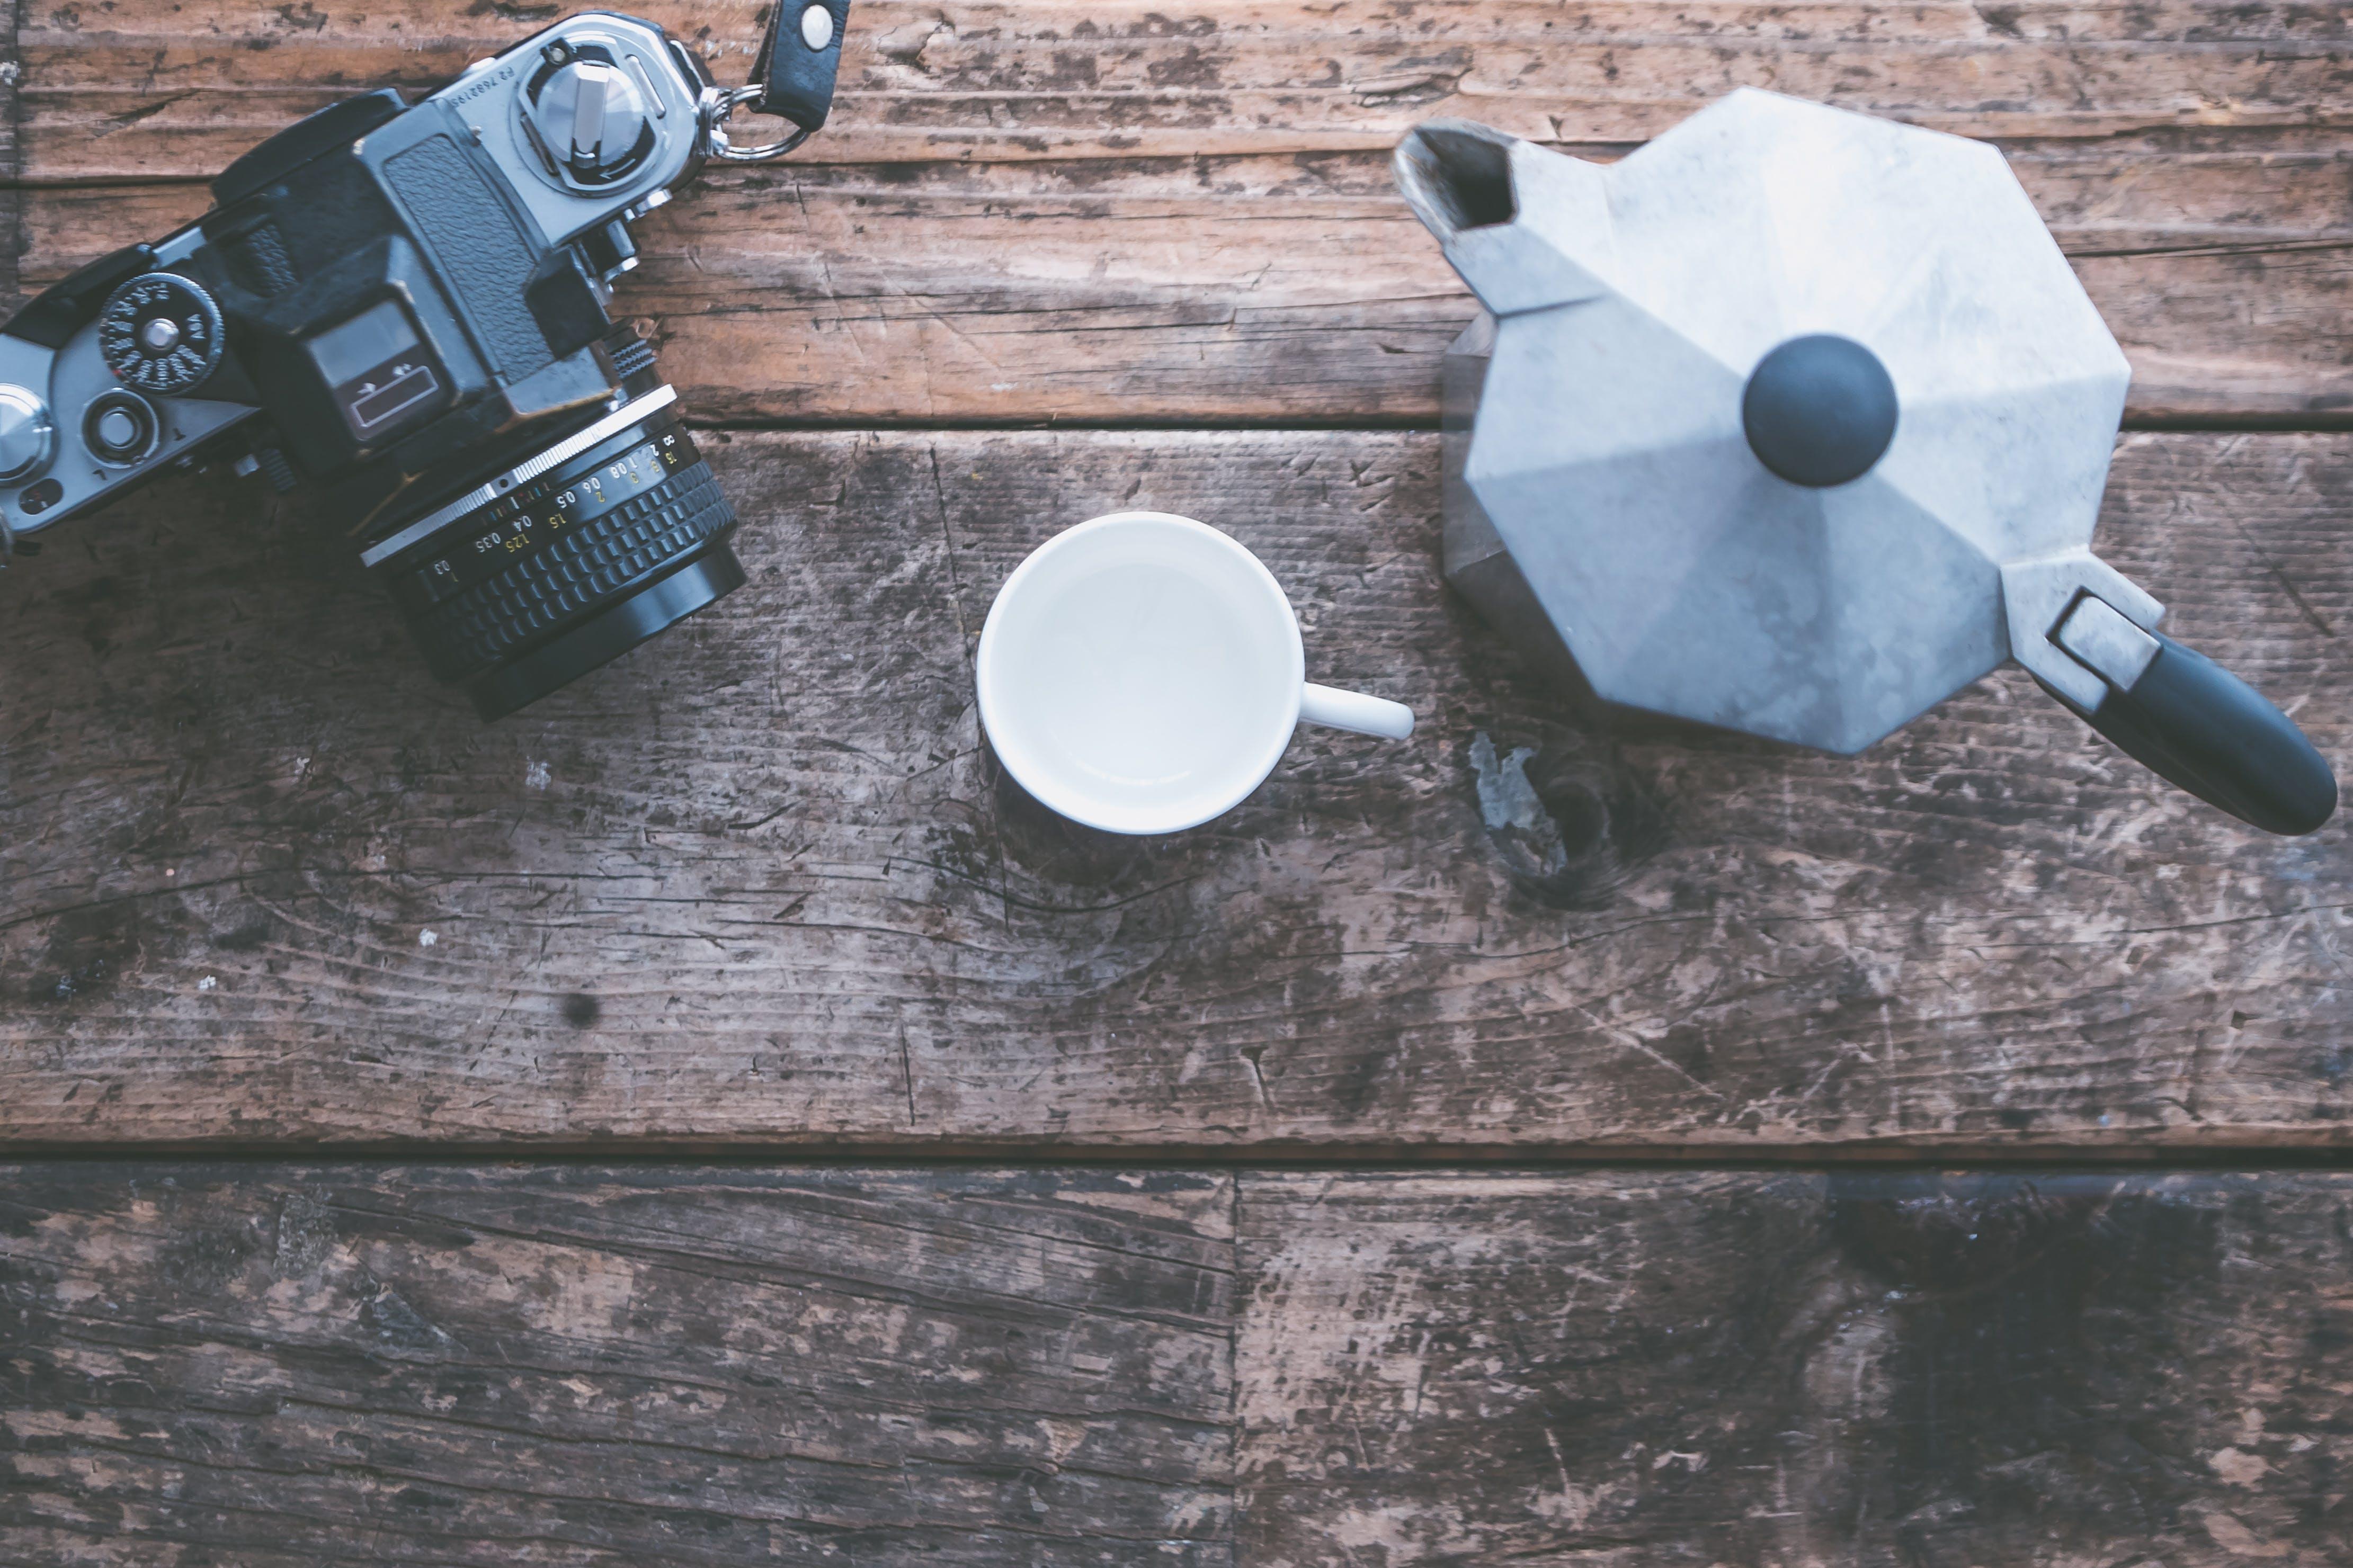 camera, cup, equipment